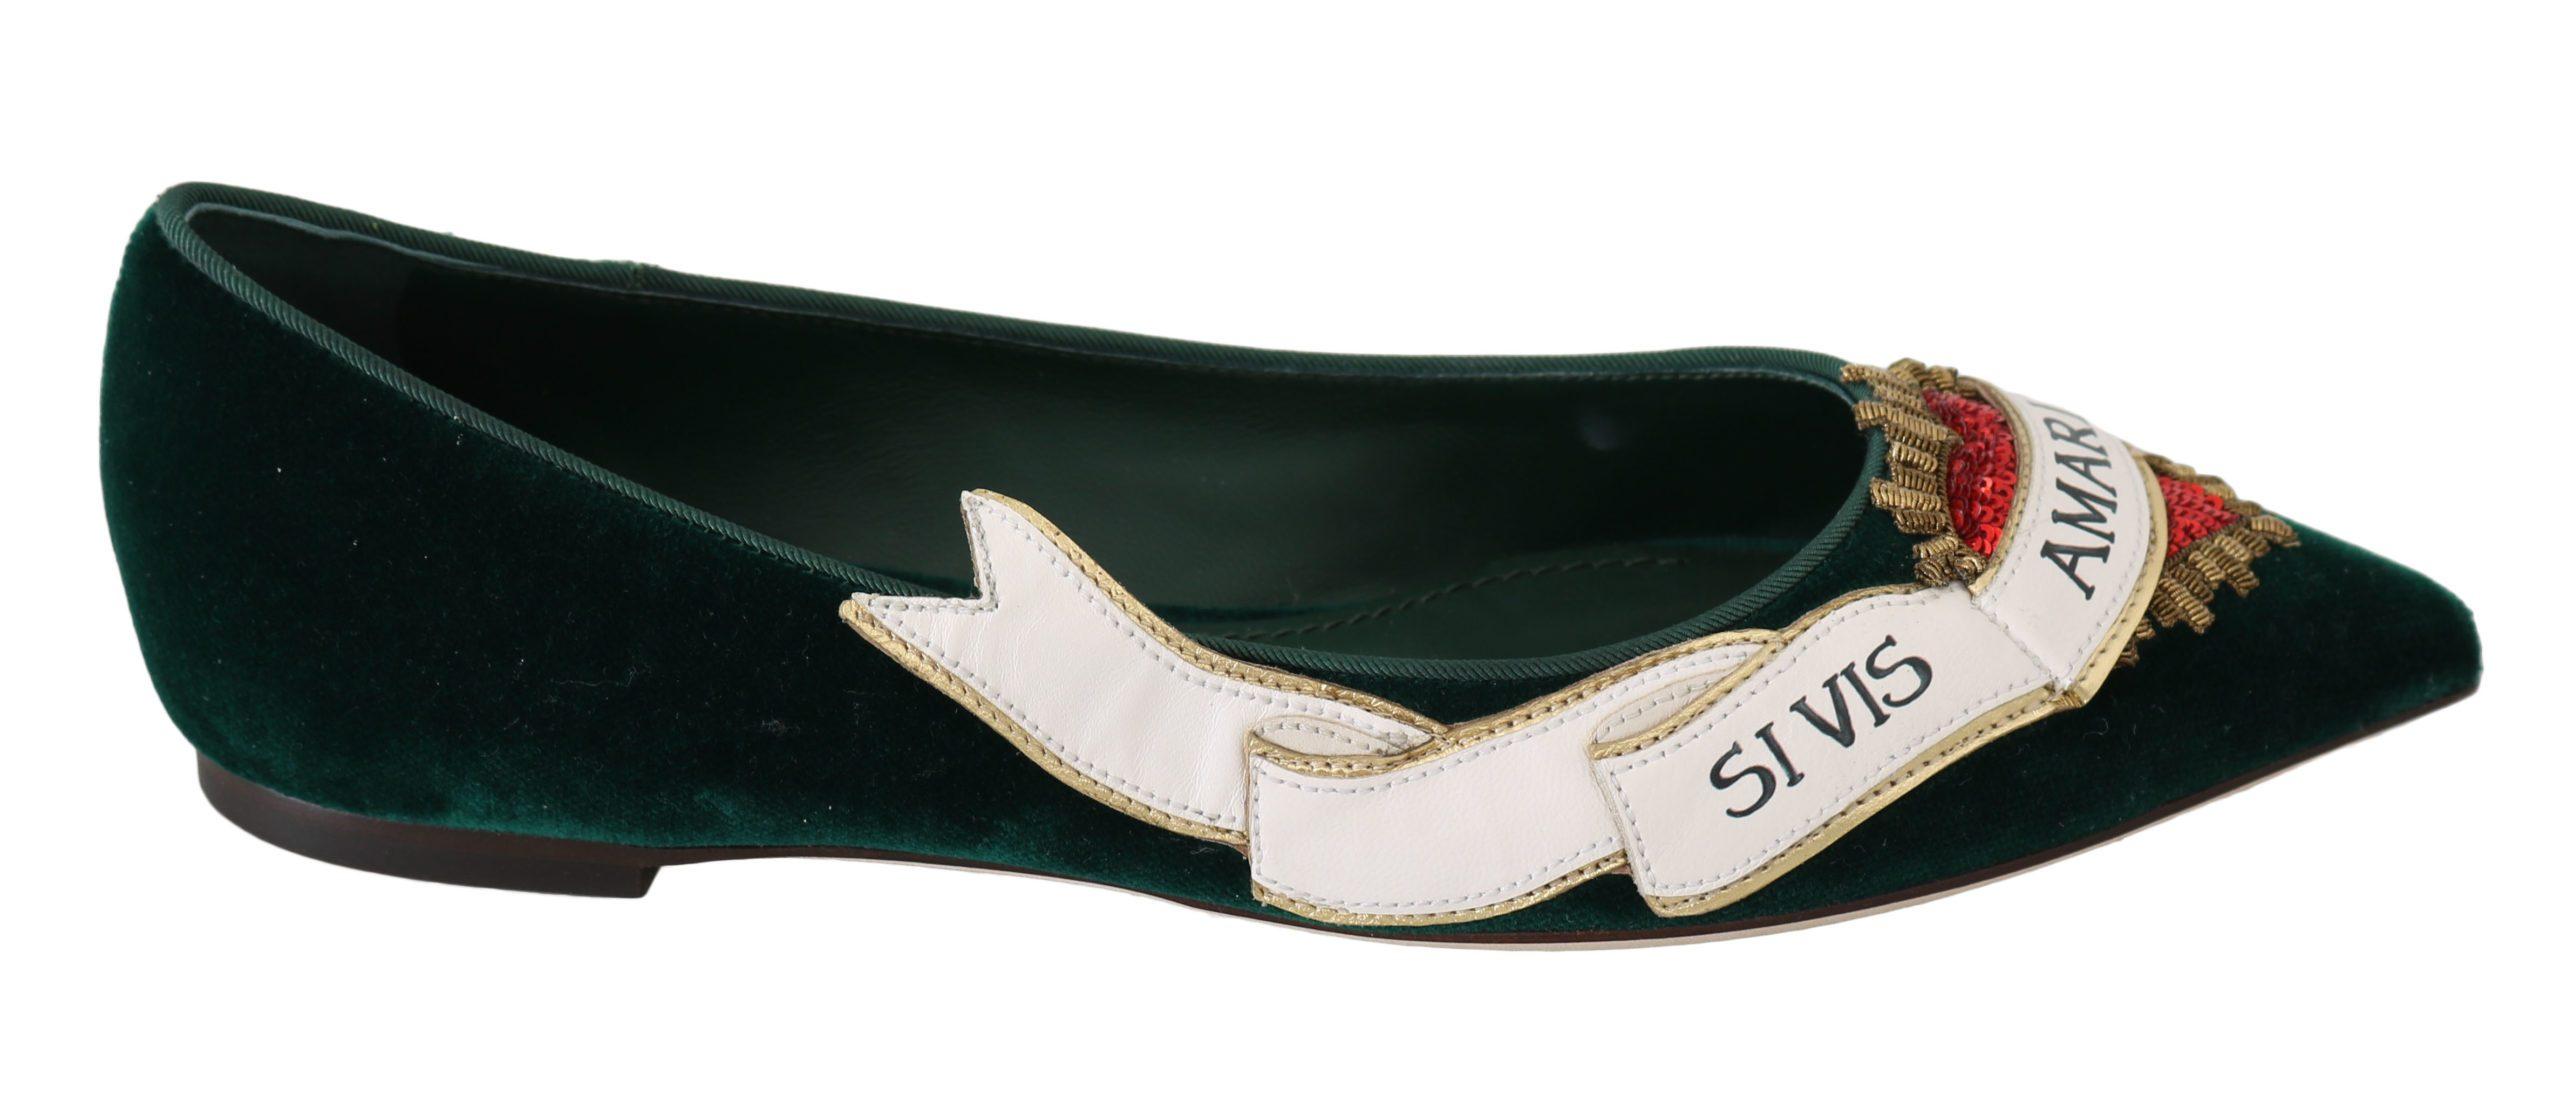 Dolce & Gabbana Women's Heart Flats Green LA6255 - EU36.5/US6